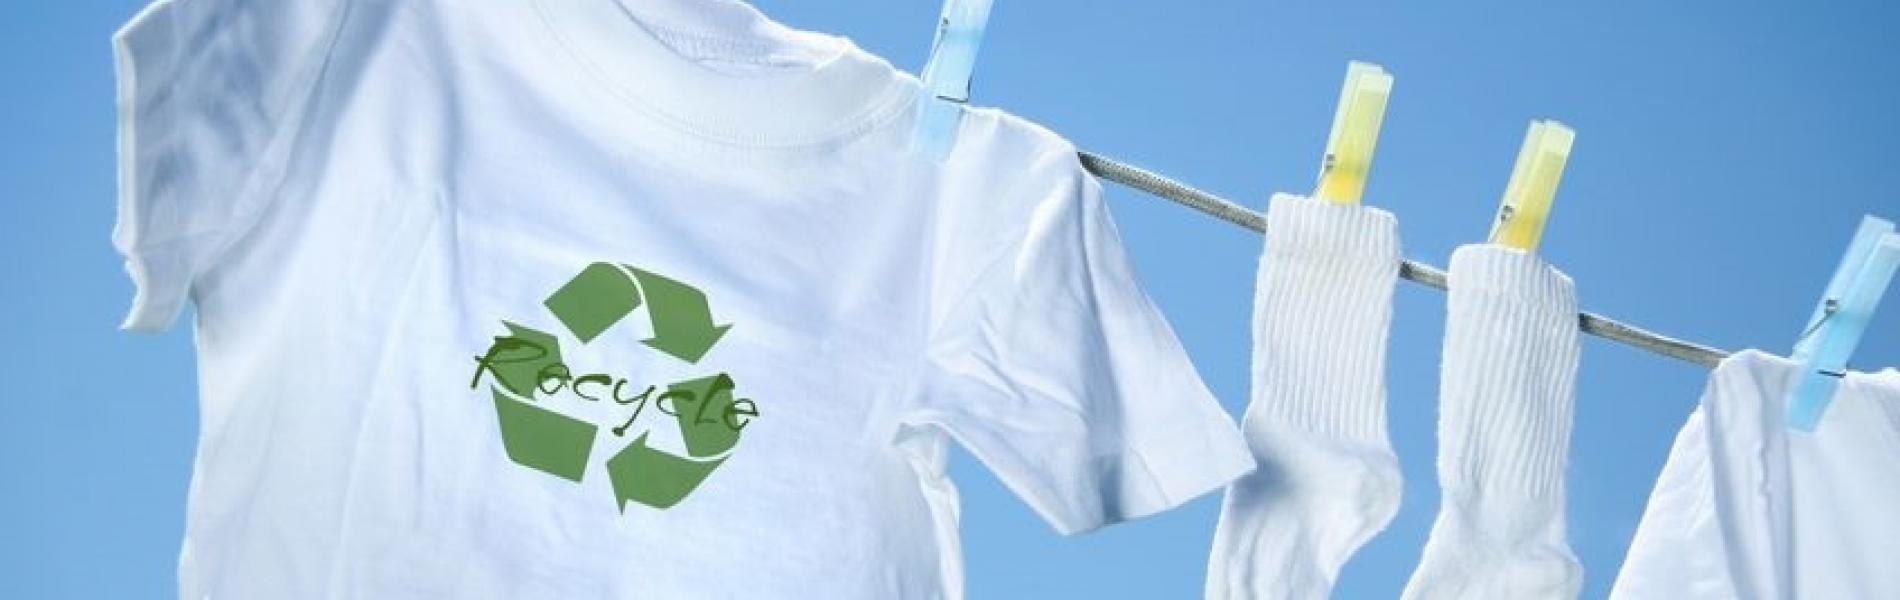 t-shirt on clothesline